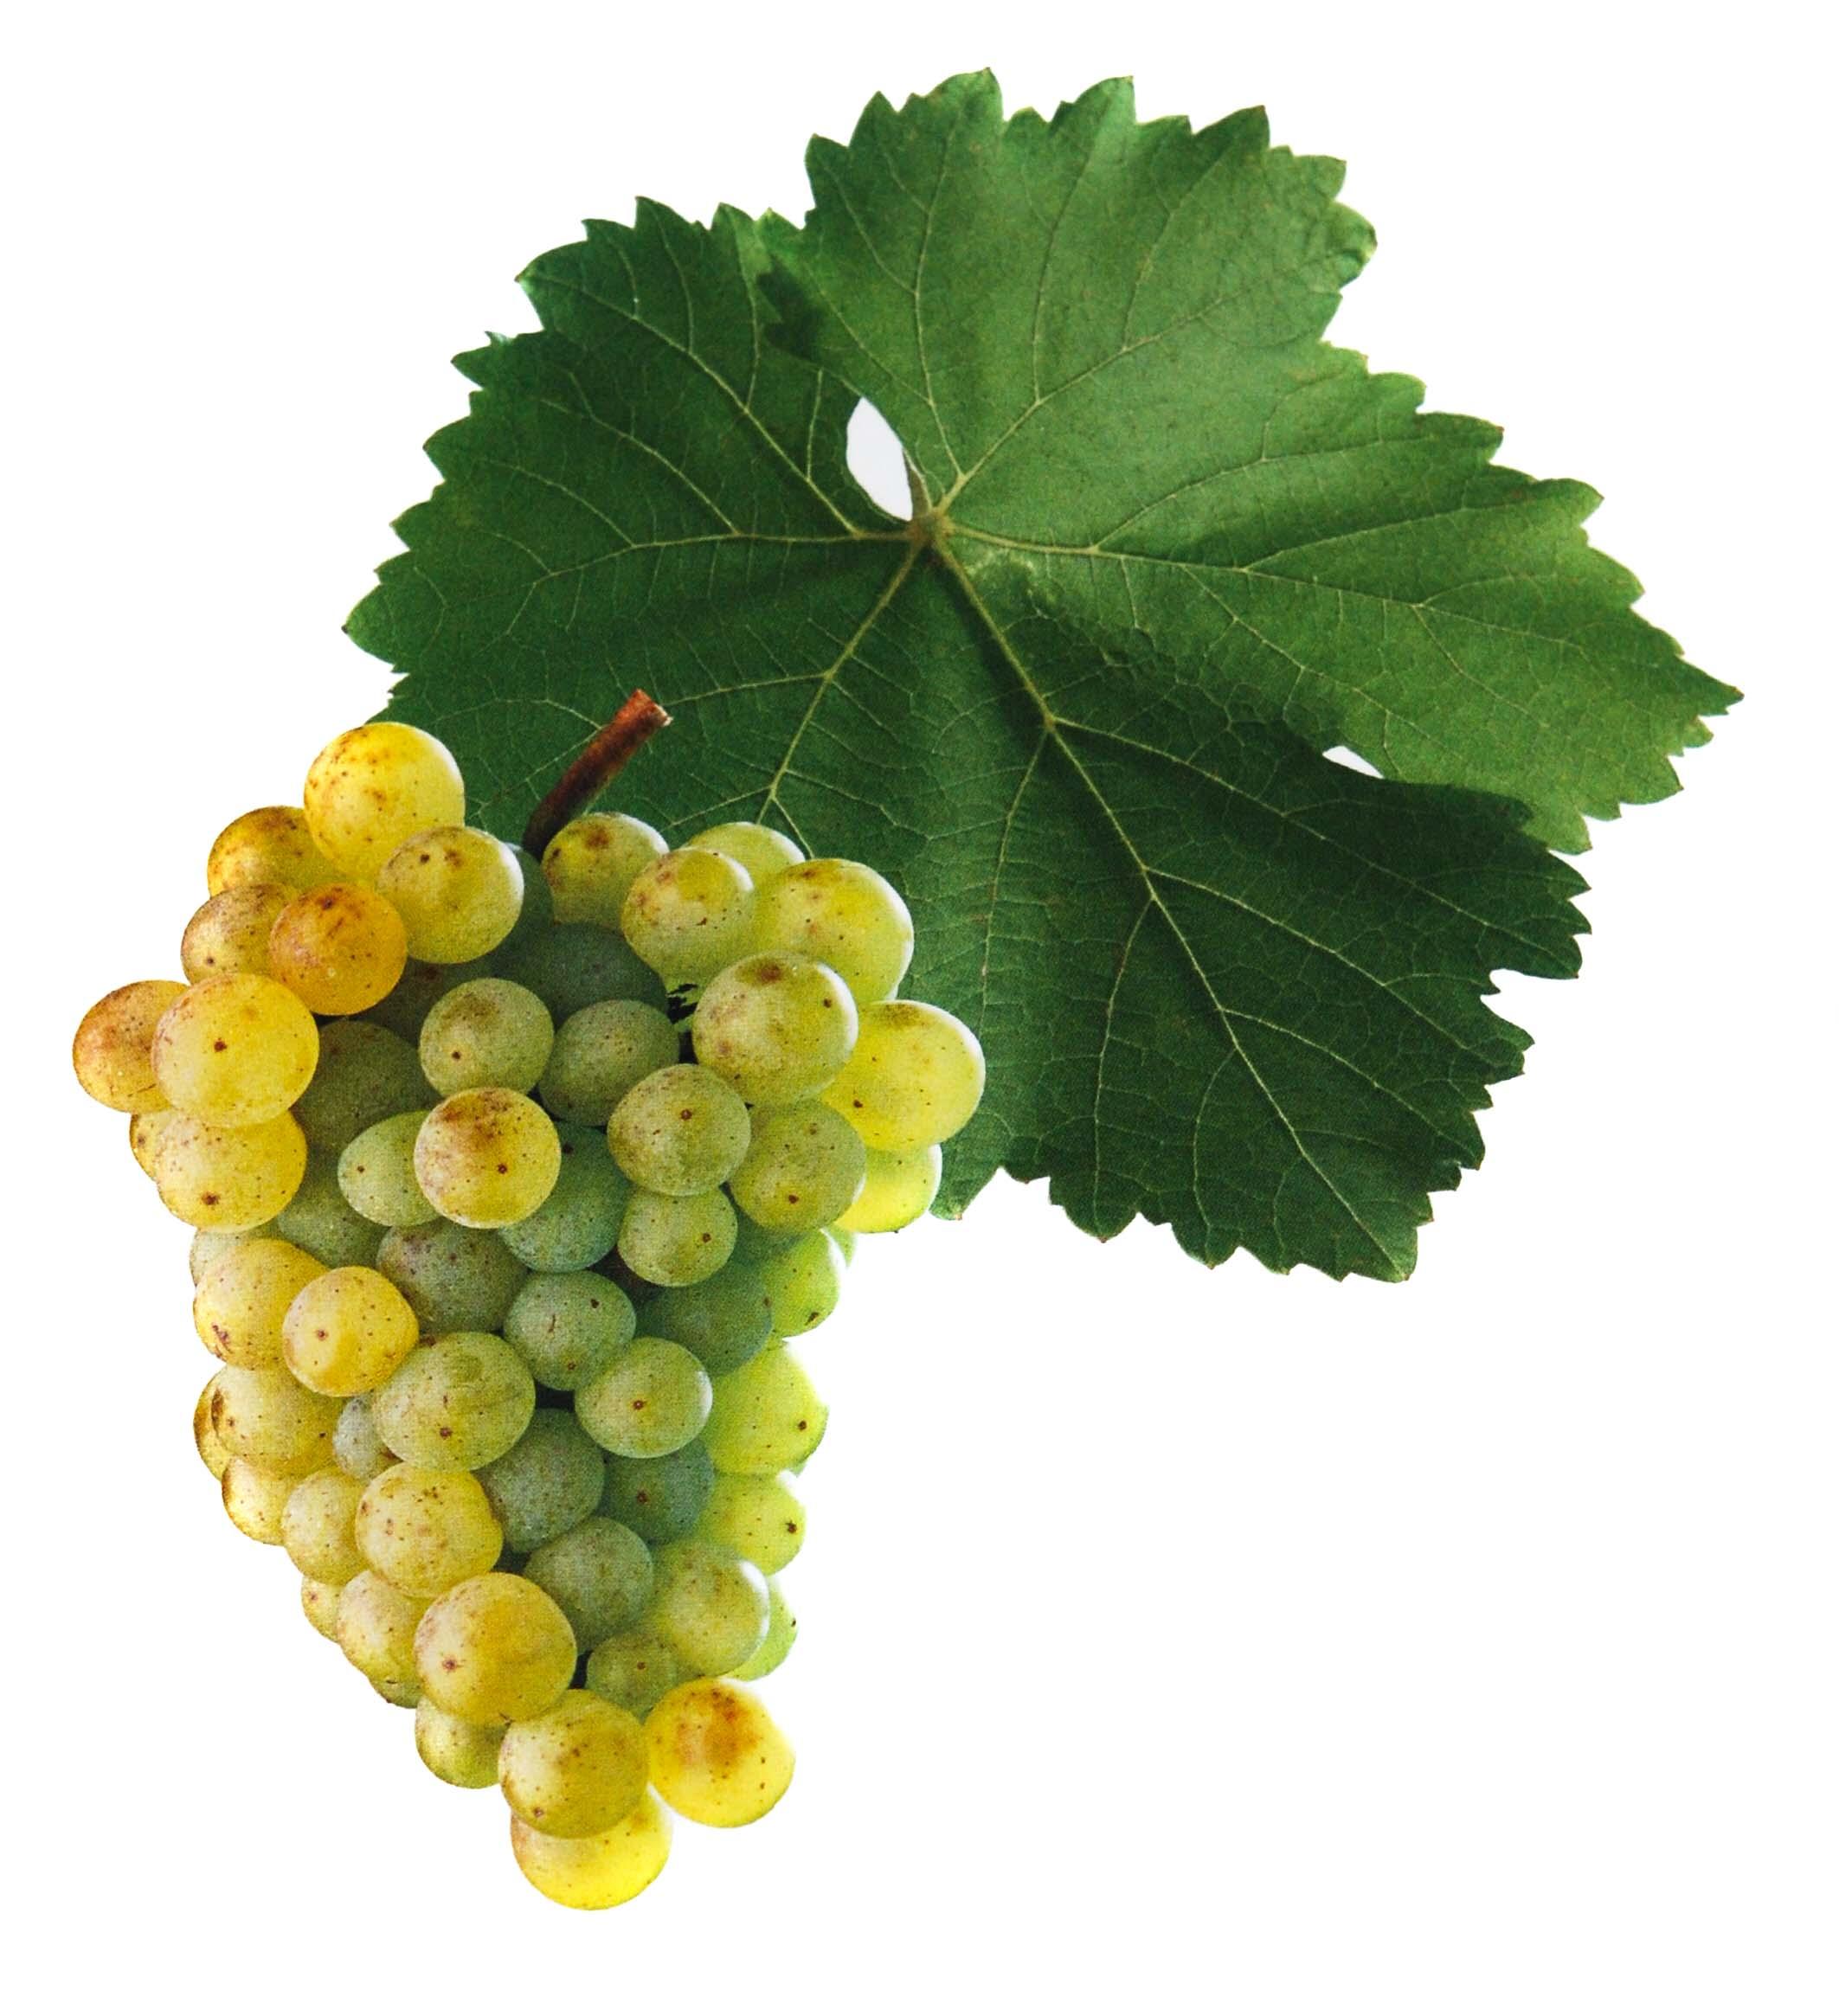 Neuburské víno hrozen a list